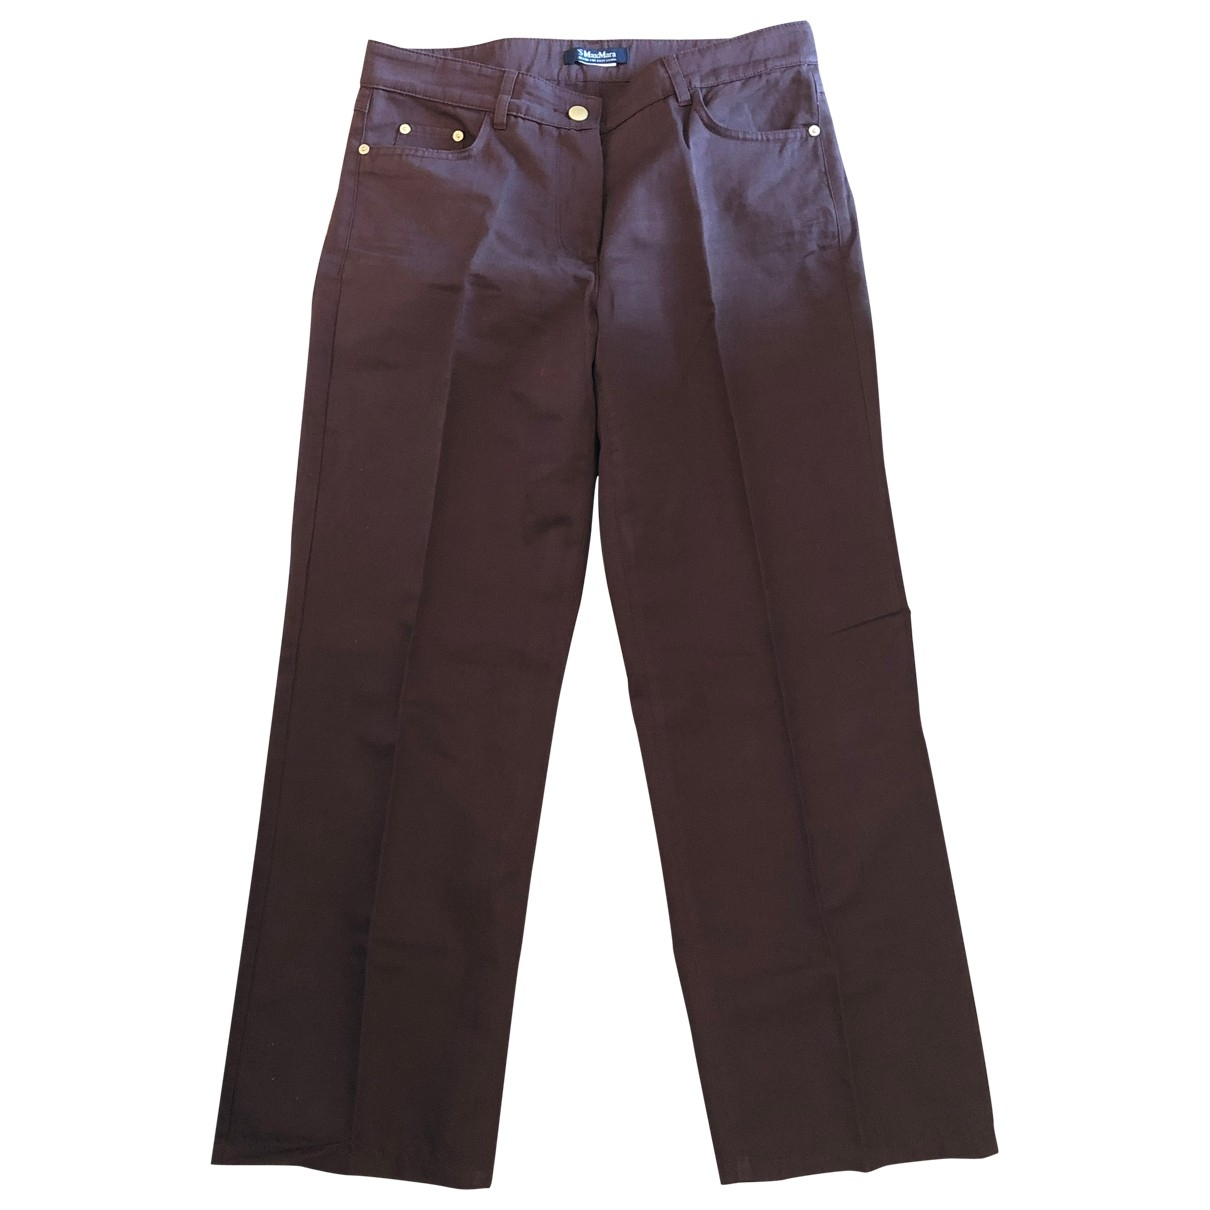 Max Mara Studio \N Burgundy Cotton Trousers for Women 42 IT